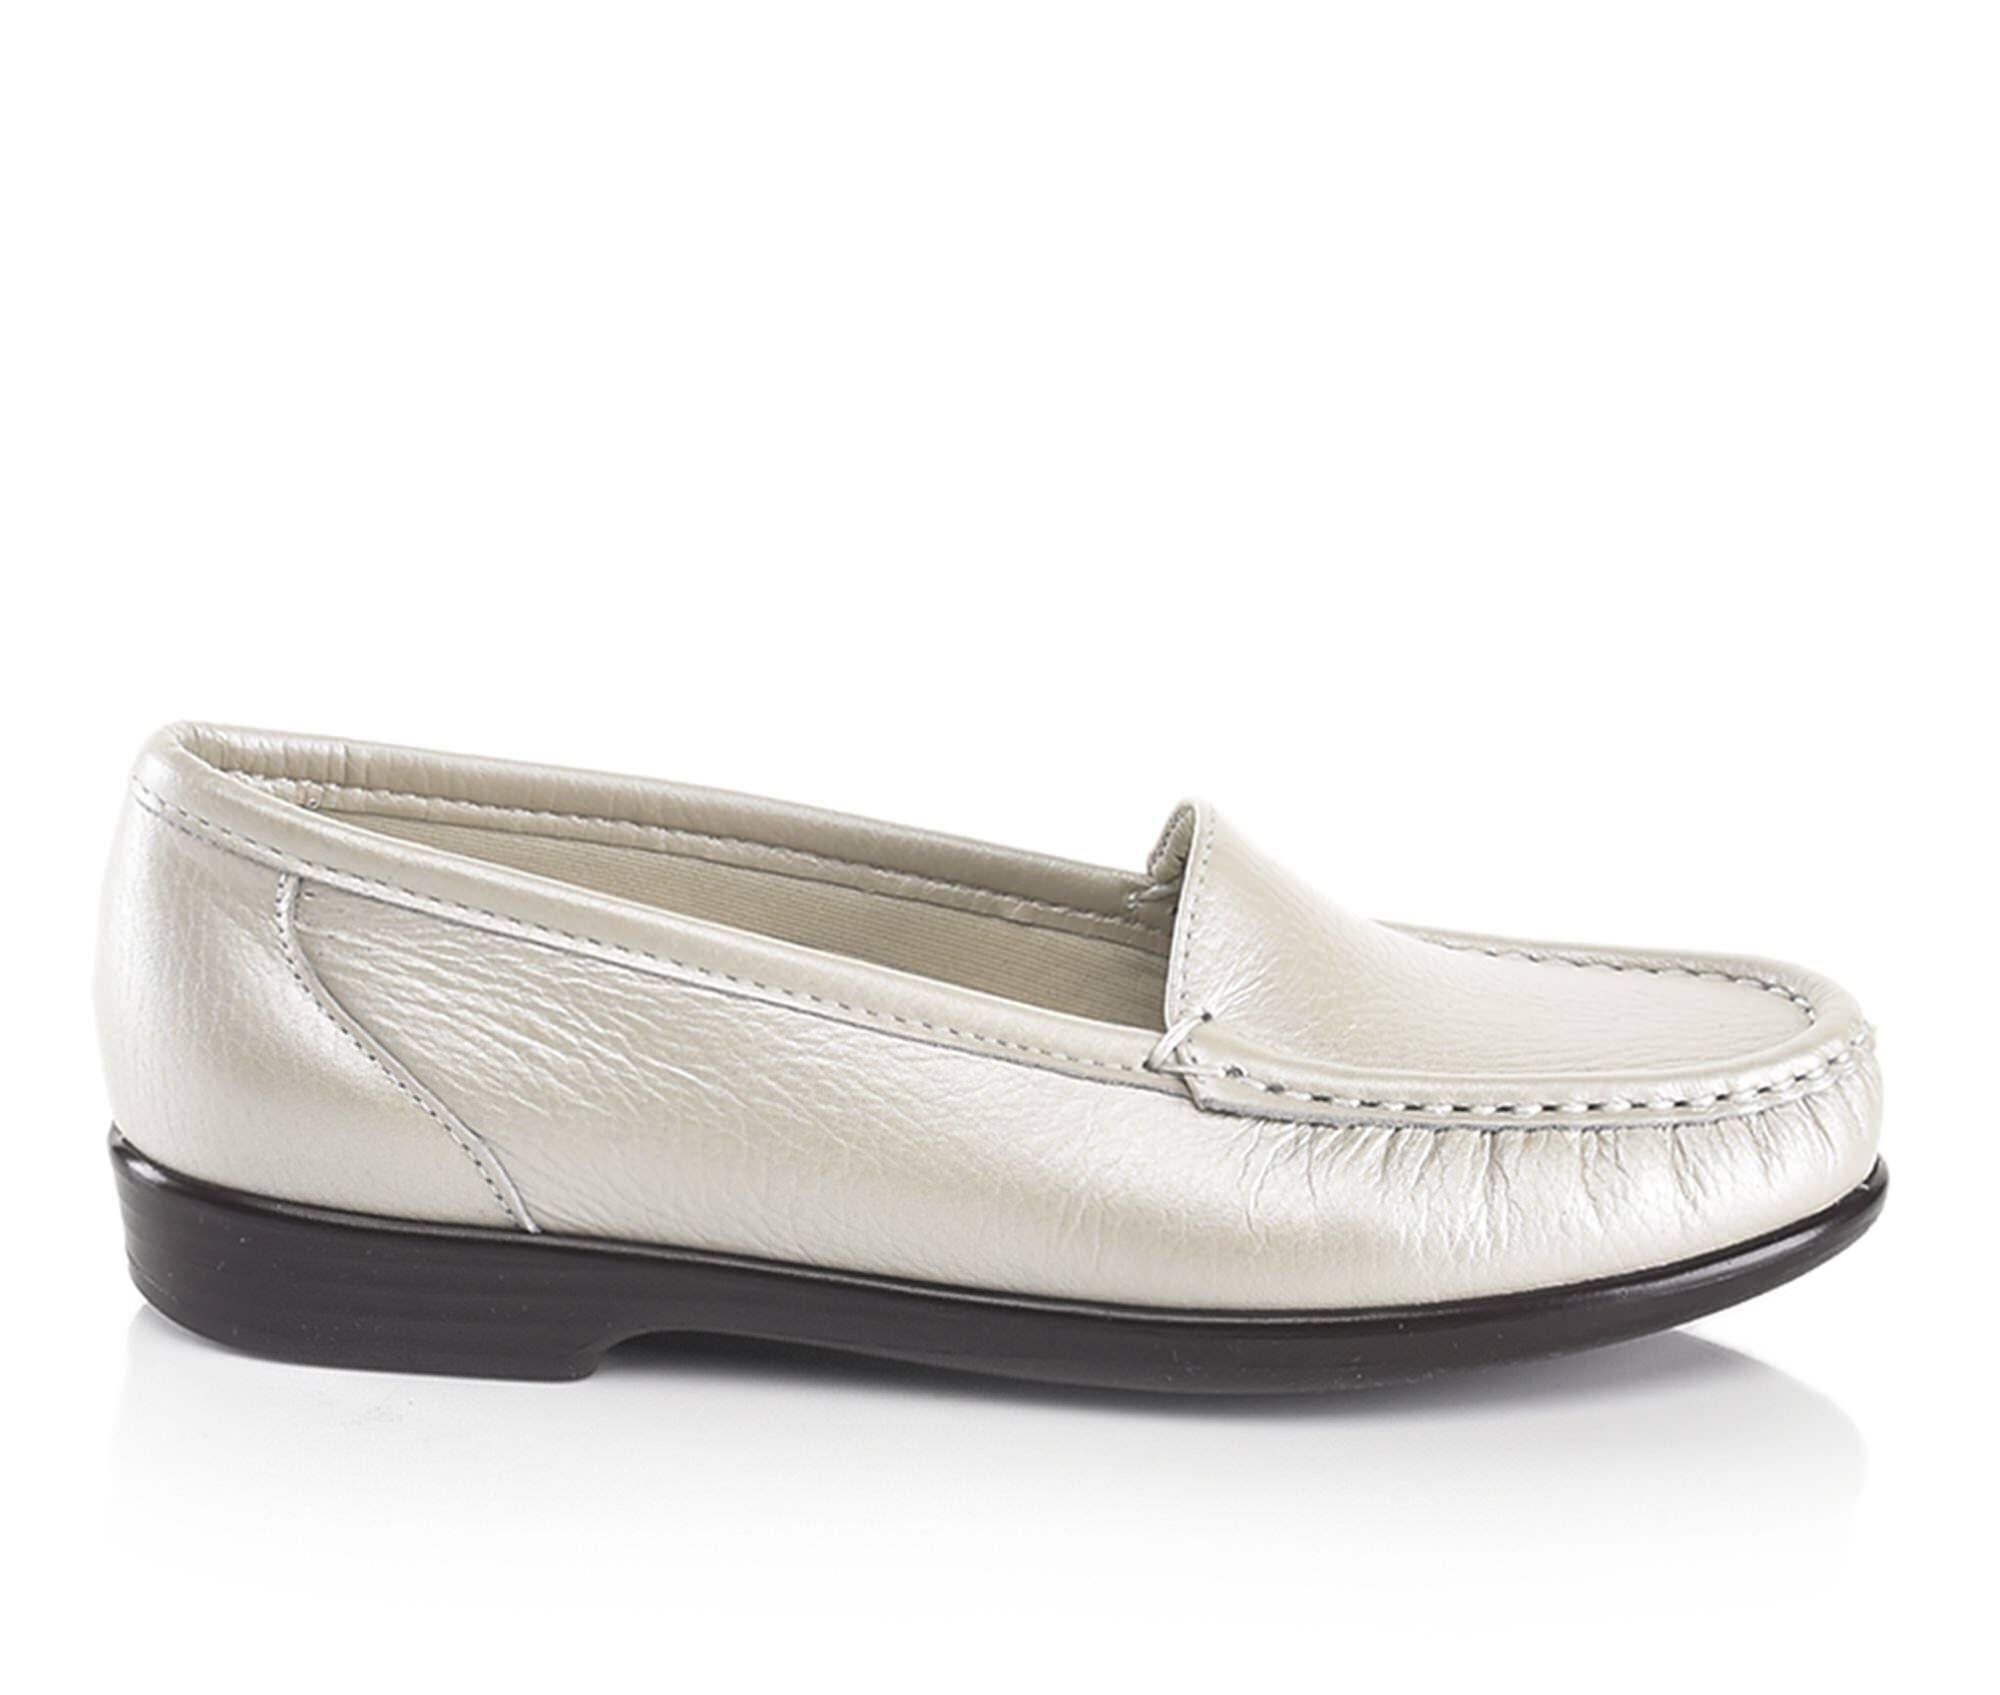 Wholesale Women's Sas Simplify Loafers Pearl Bone